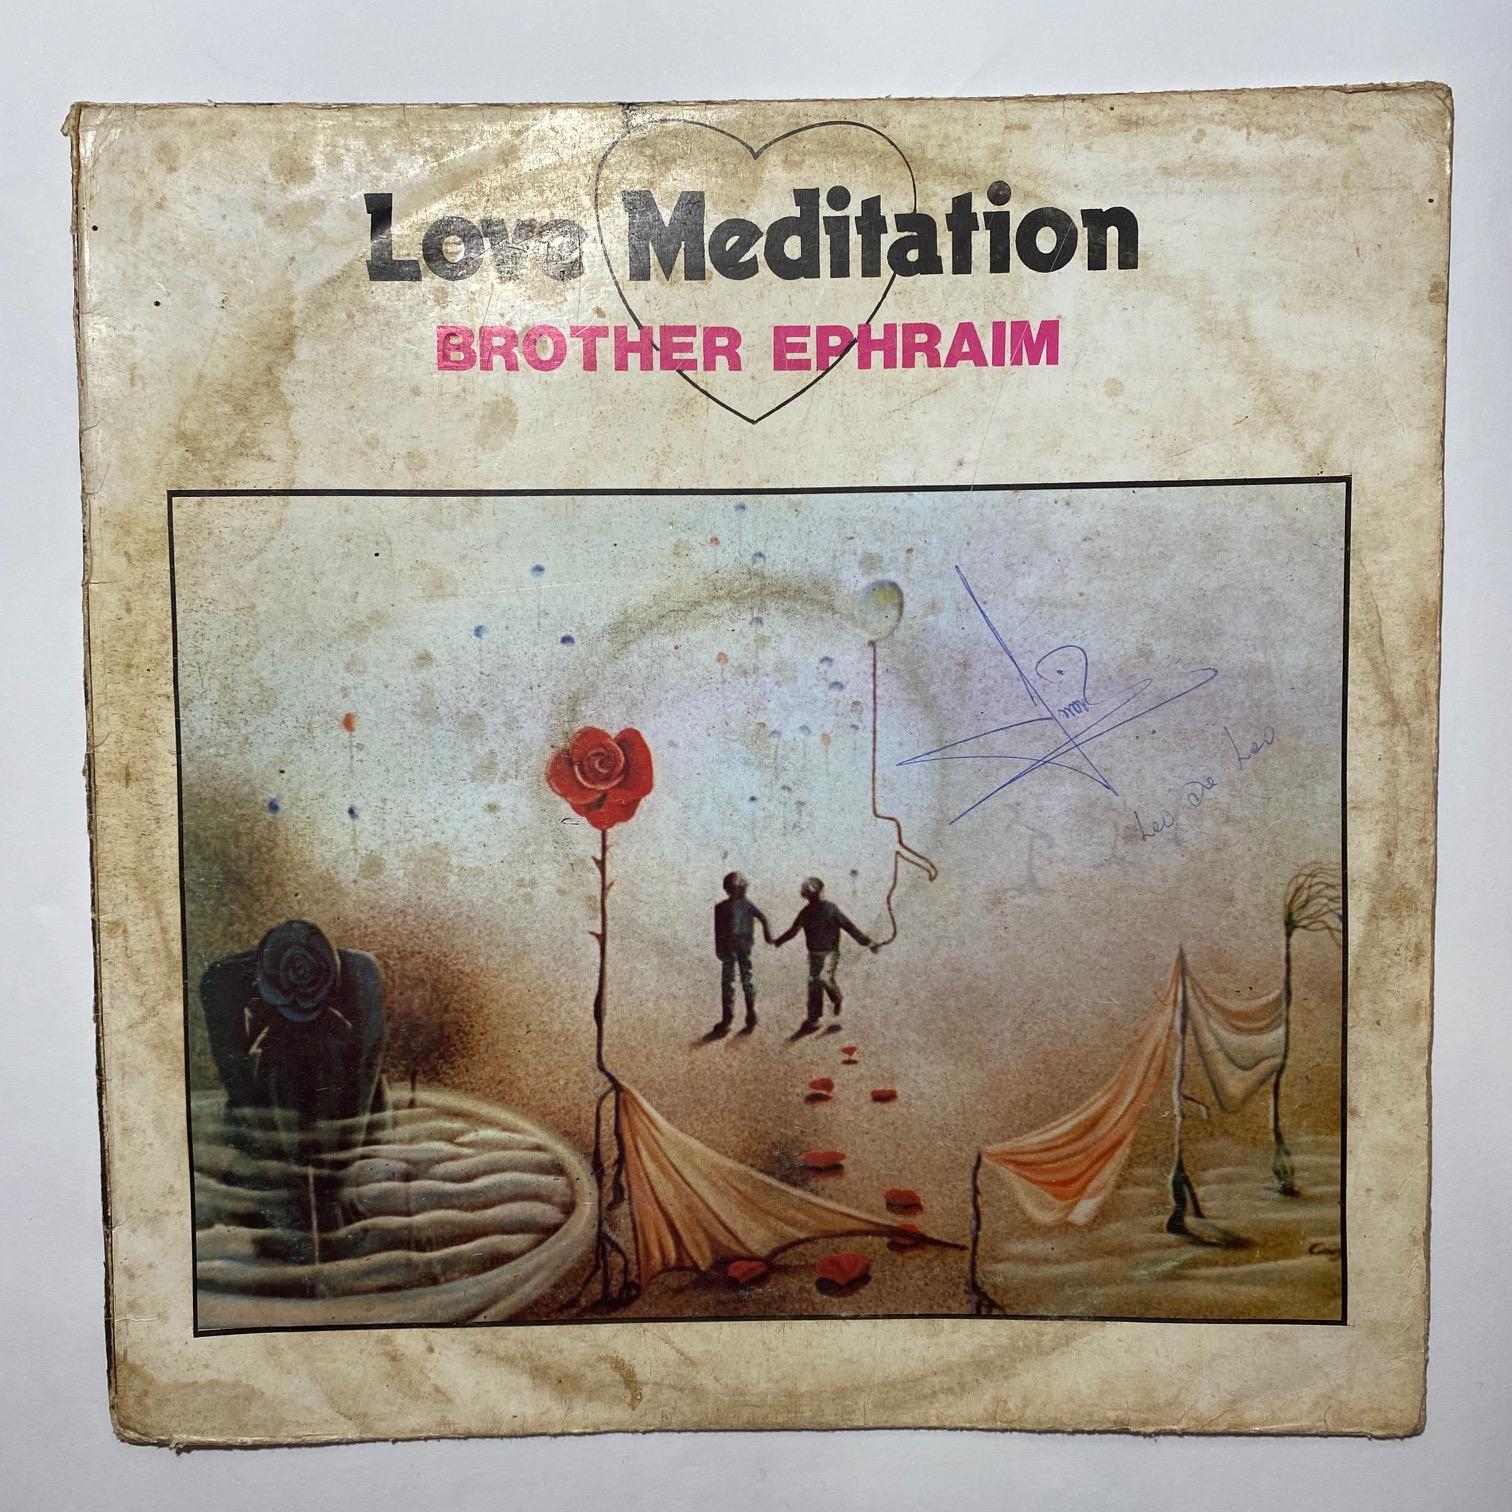 BROTHER EPHRAIM - Love meditation - 33T